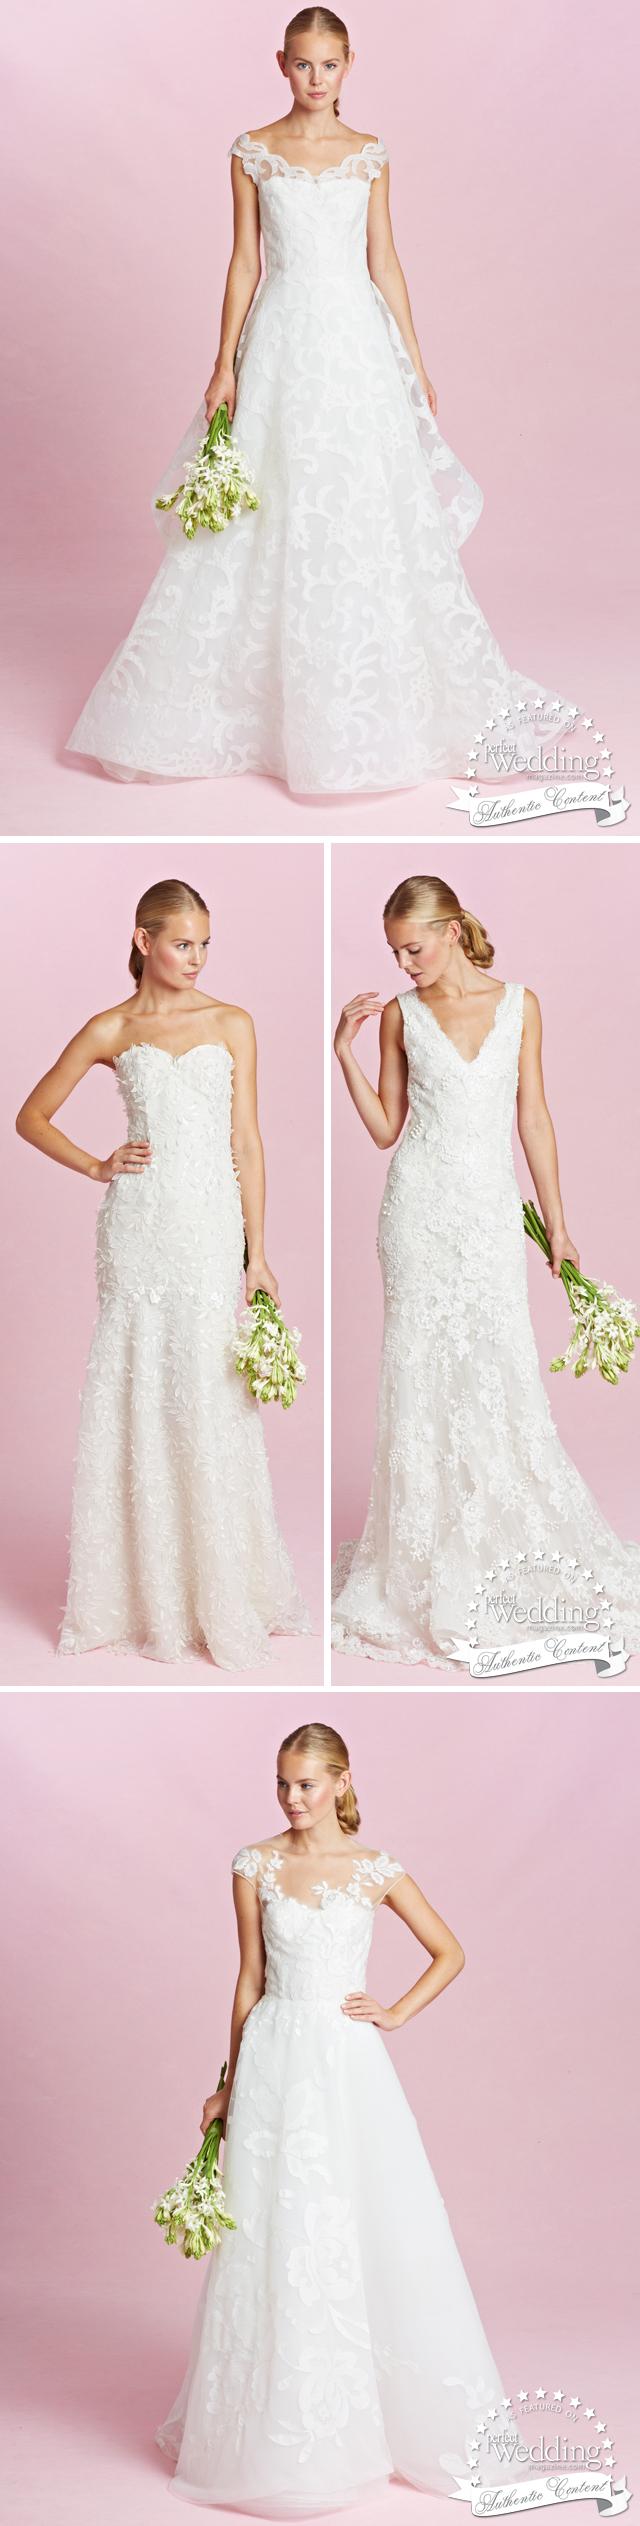 Oscar de la Renta, Oscar de la Renta Fall 2015 Bridal Collection, Fall Bridal Trends, Perfect Wedding Magazine, Perfect Wedding Magazine Blog